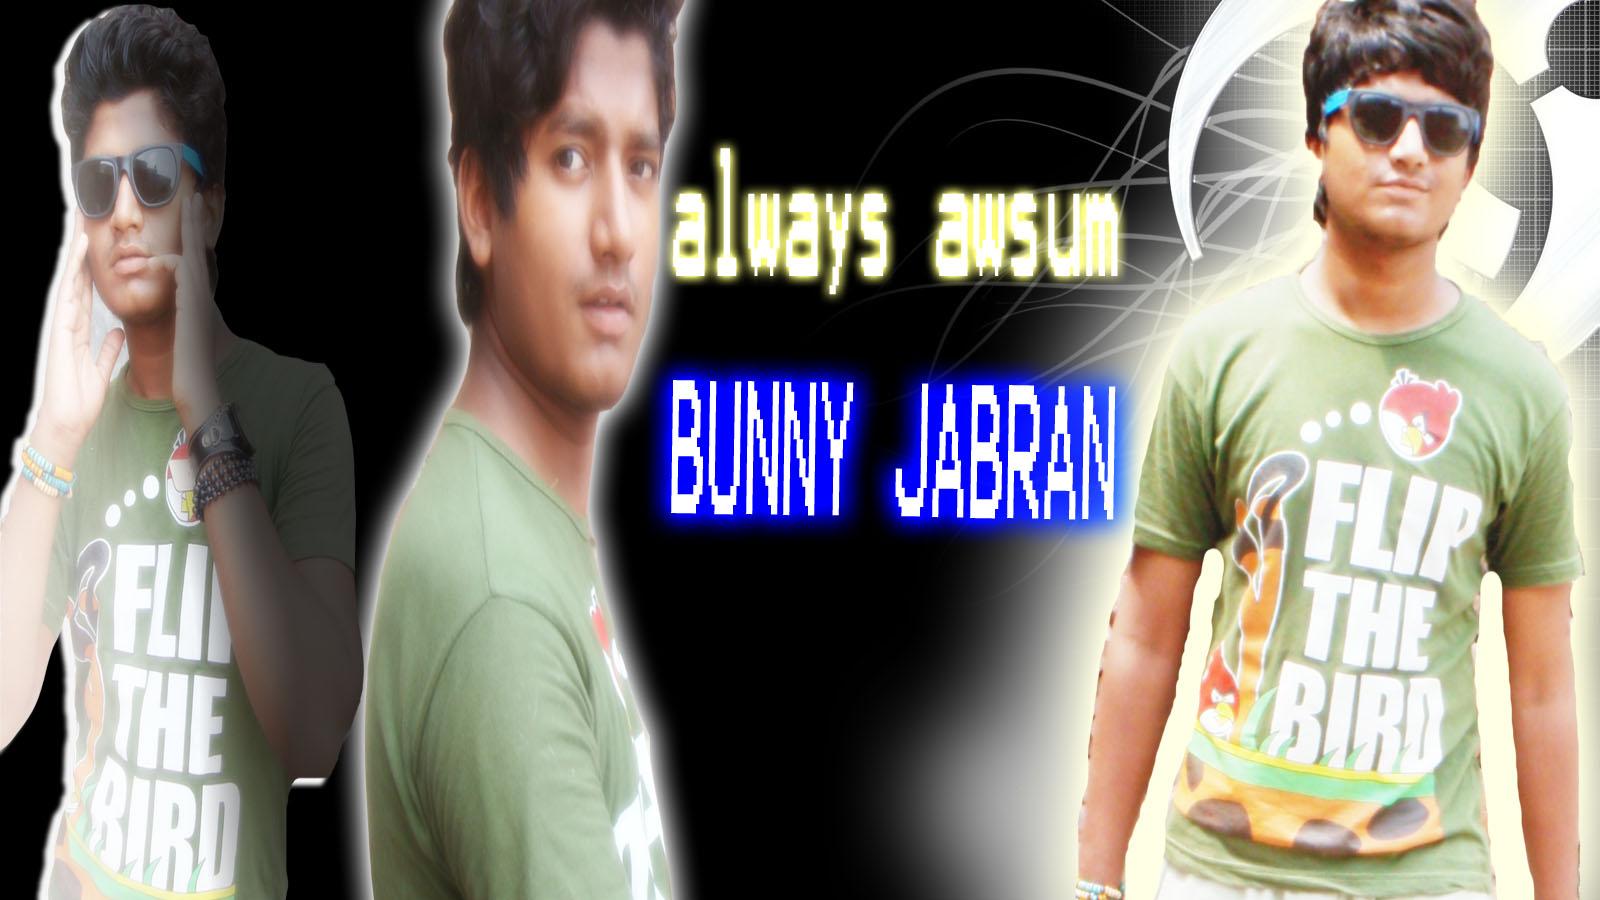 jabzi jabran   Emo Boys Photo  32070513    Fanpop fanclubs HD Wallpaper